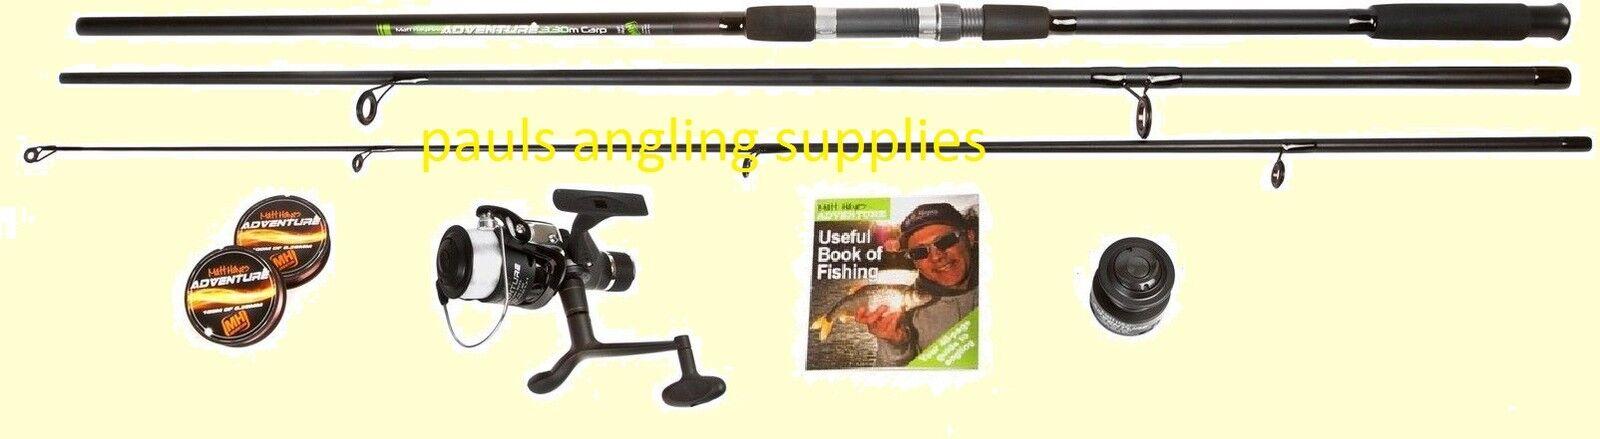 Matt Hayes Adventure 12 Ft Carp Fishing  Rod With Reel Line Combo